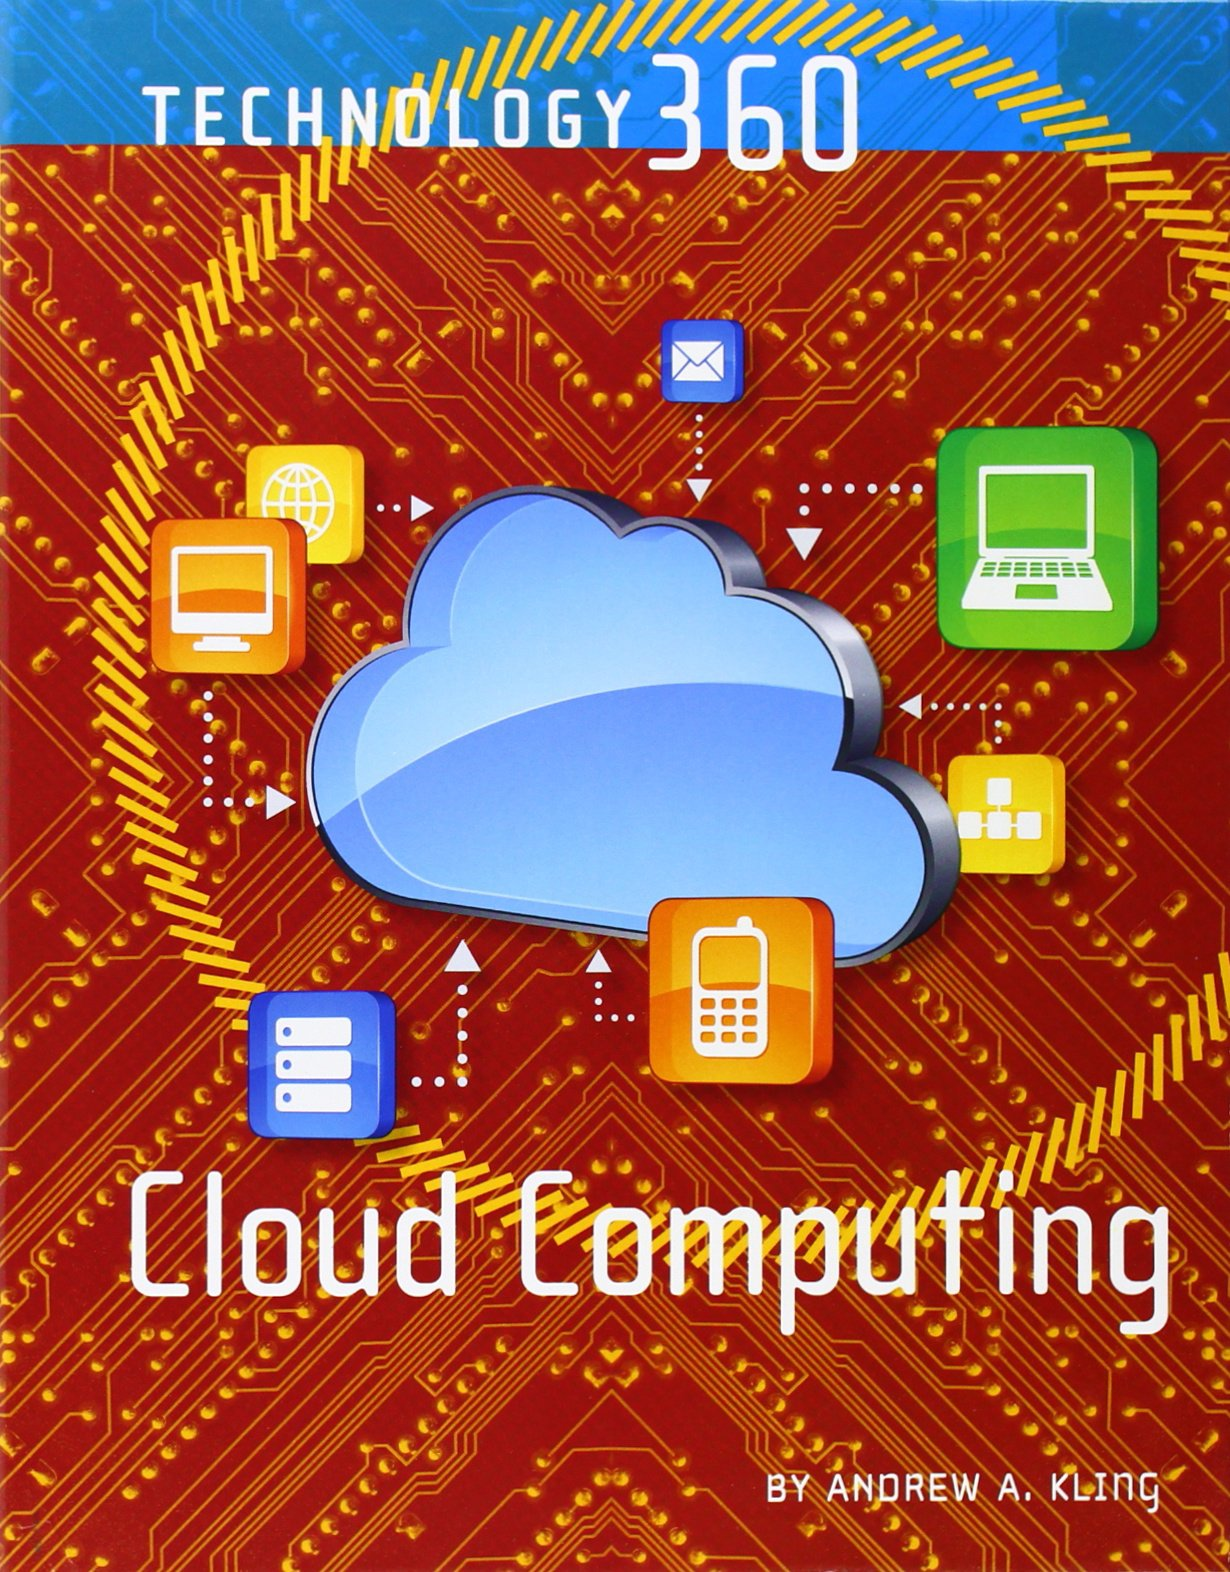 Cloud Computing (Technology 360) pdf